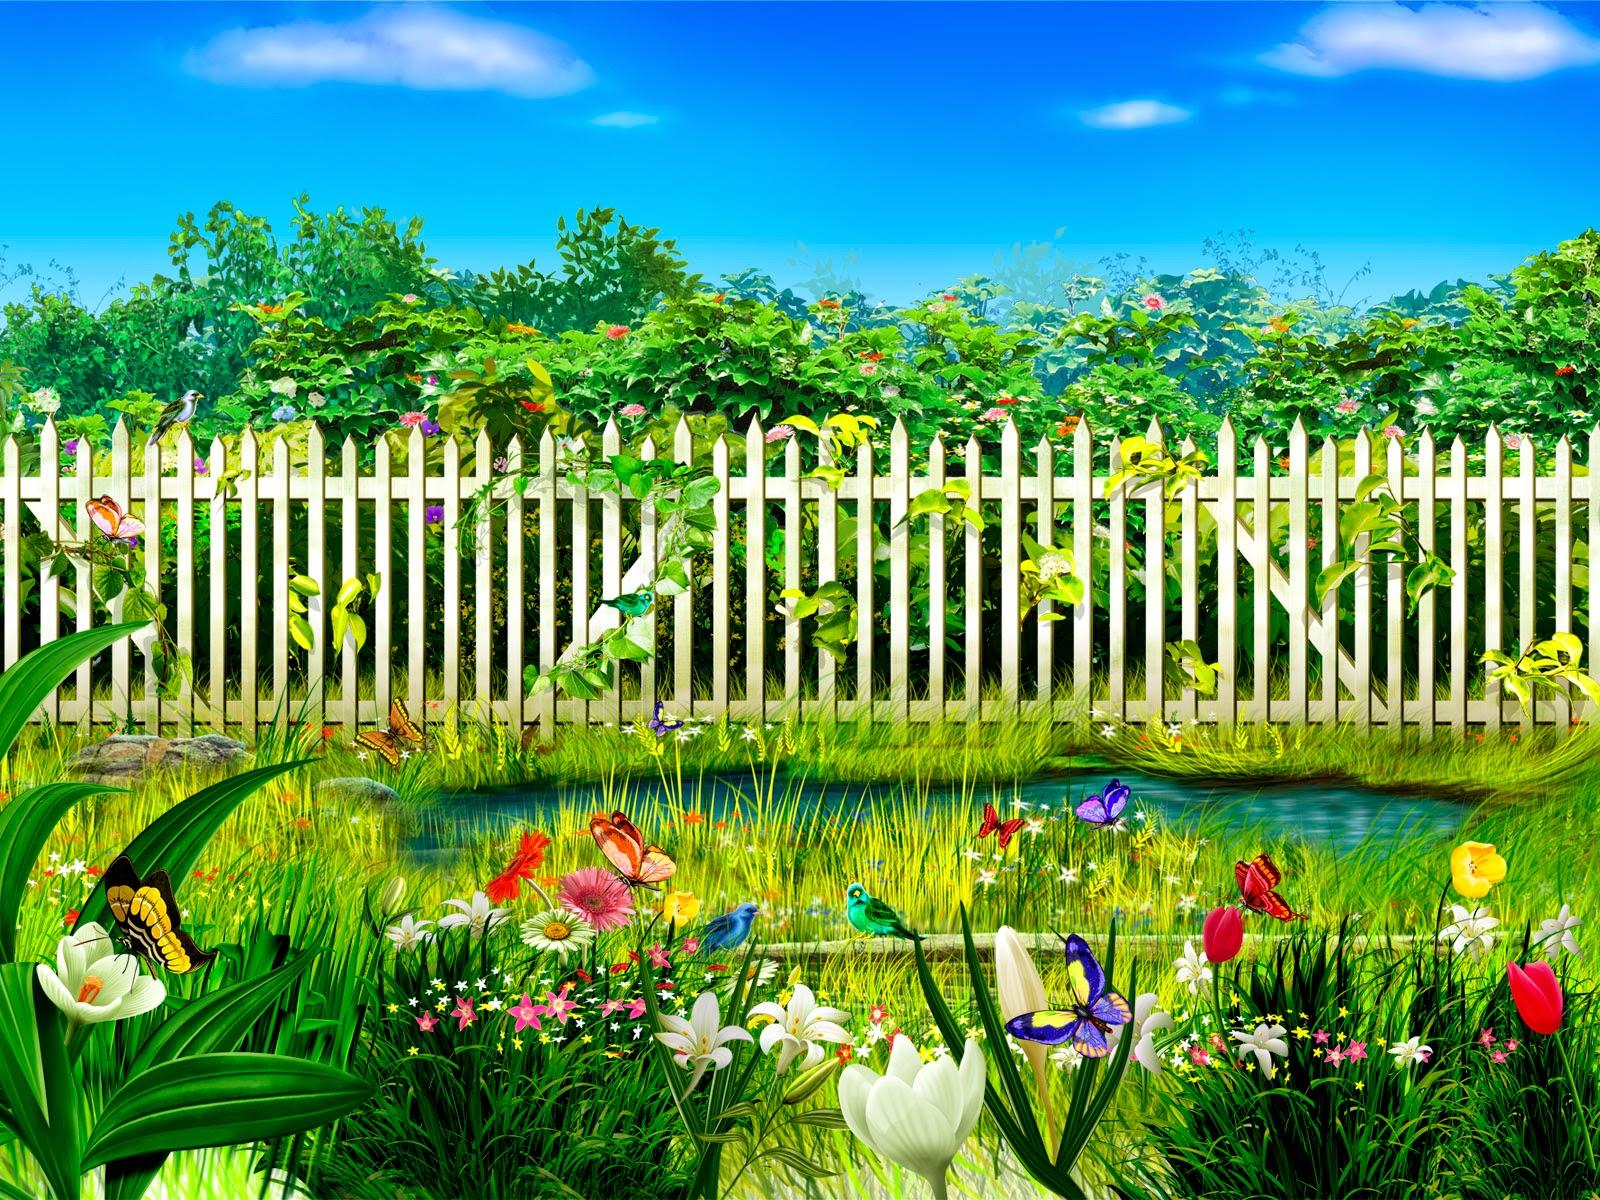 Flower Garden Wallpaper Background flower garden wallpaper love flowers wallpapers h throughout